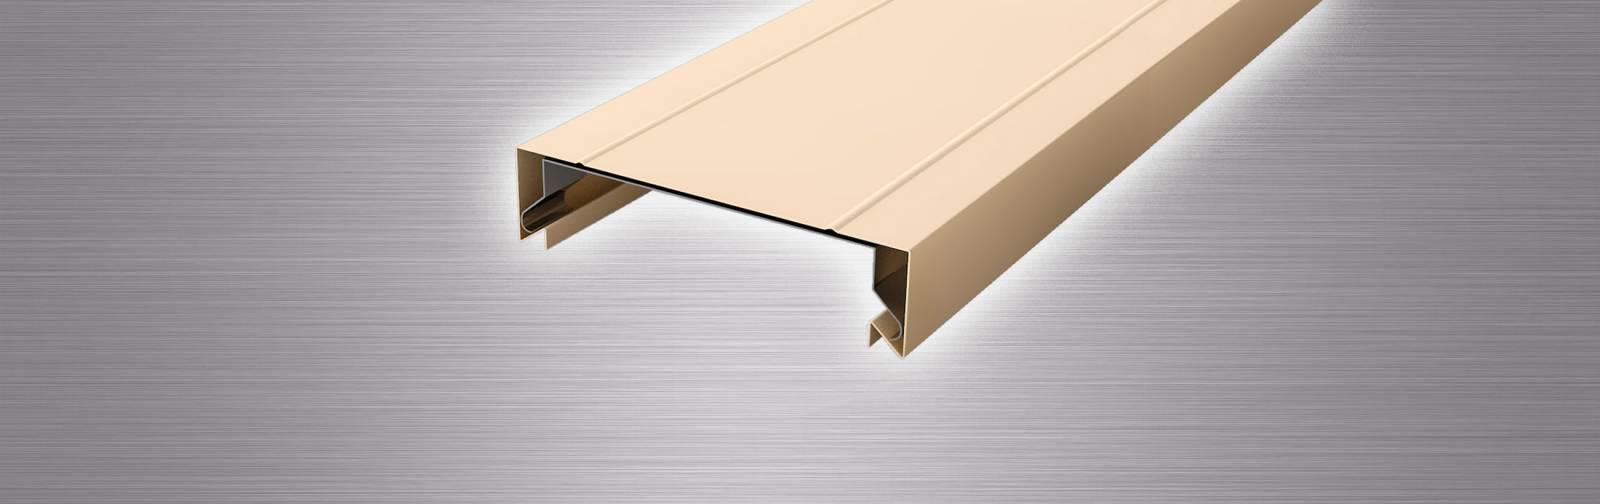 fabrication et installation de goutti res boll ne et. Black Bedroom Furniture Sets. Home Design Ideas